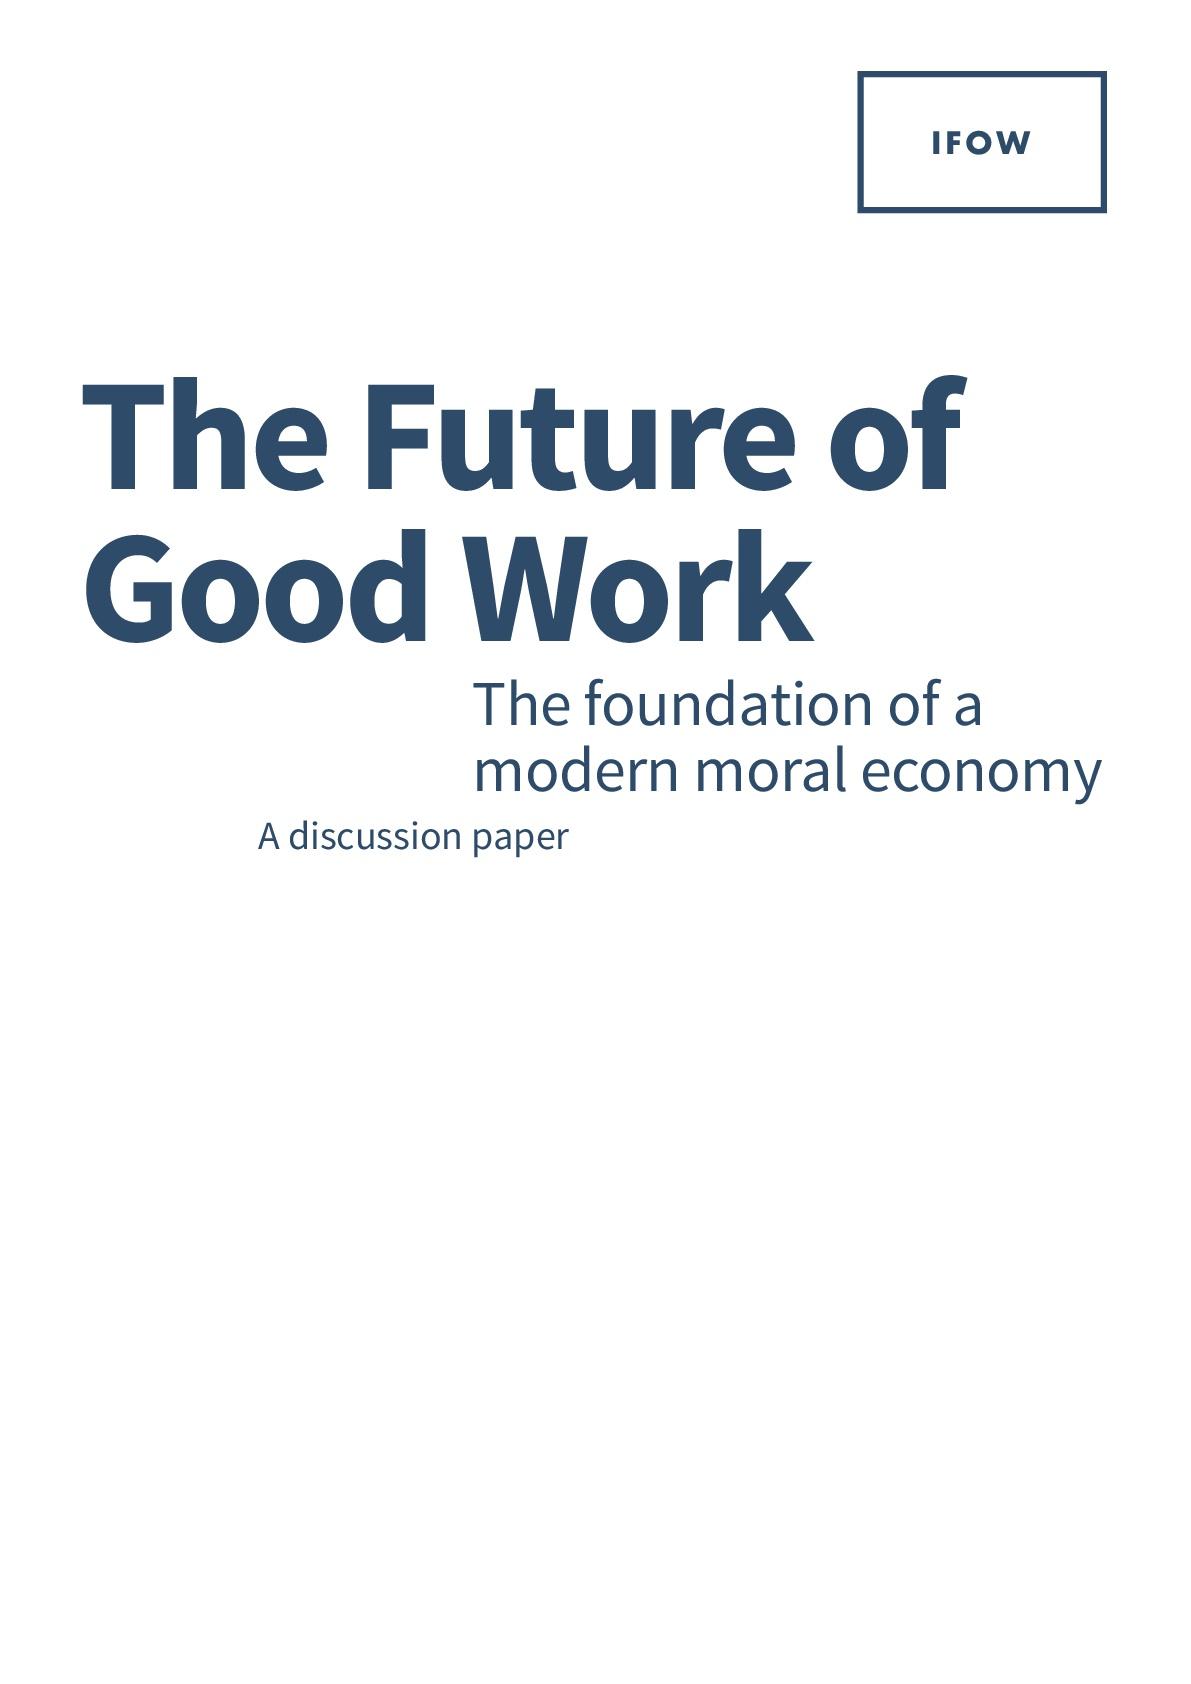 The+Future+of+Good+Work-v7-2.11.18-001.jpg